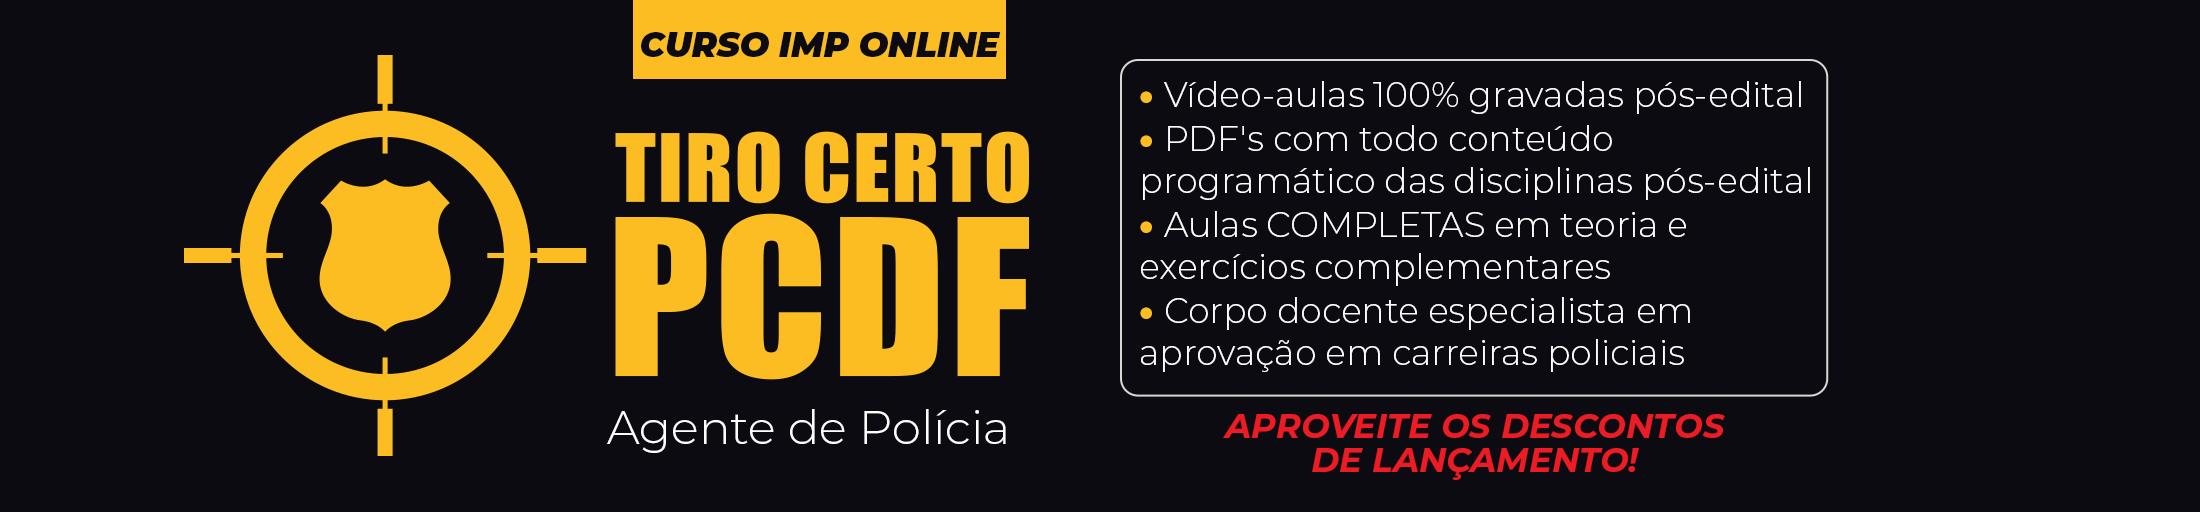 BANNER_SITE_PRESENCIAL_-_PCDF_EDITAL_PUBLICADO_-_TIRO_CERTO